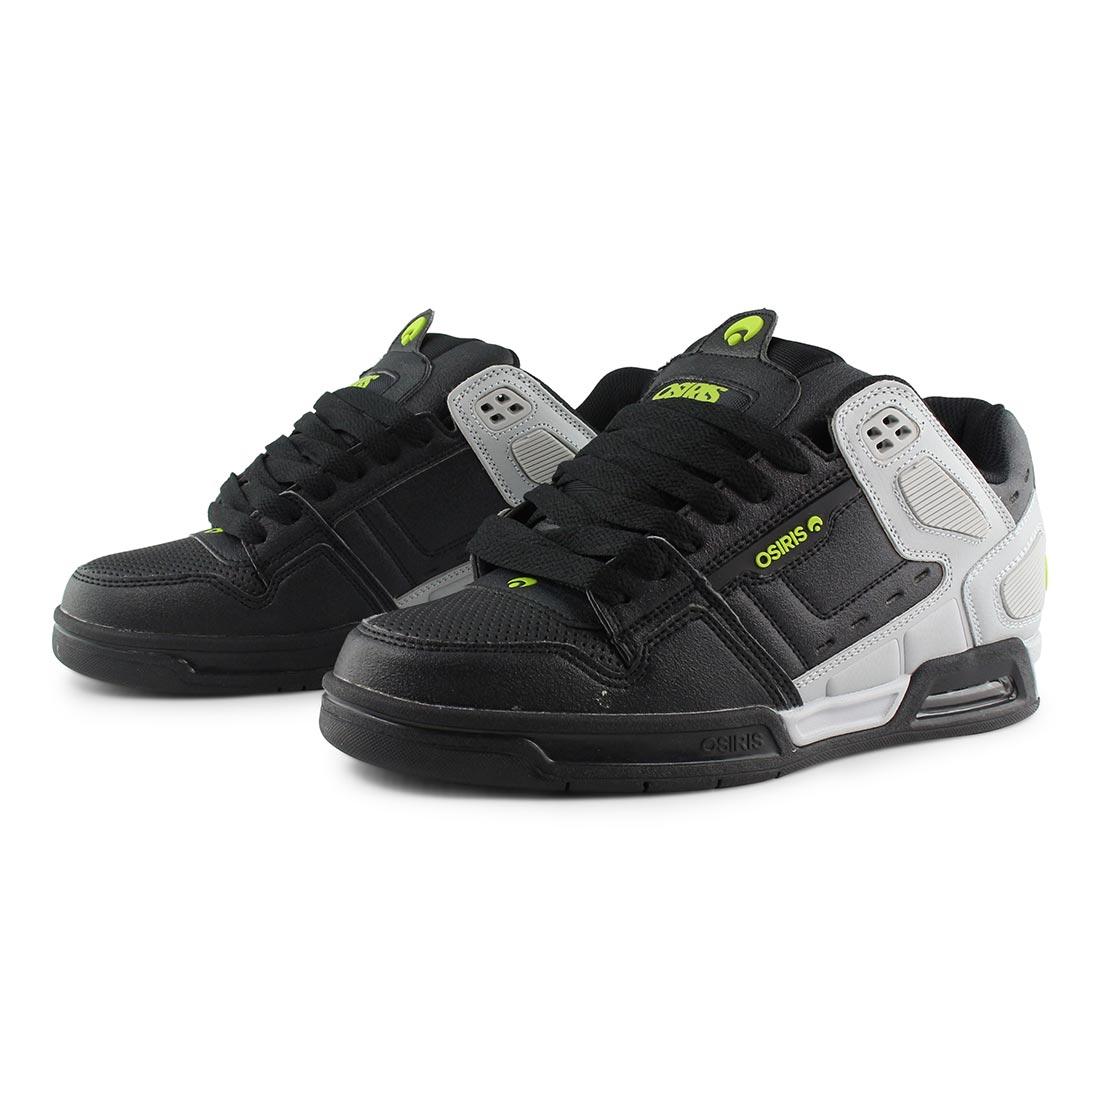 Osiris Peril Shoes - Lt. Grey / Black / Lime